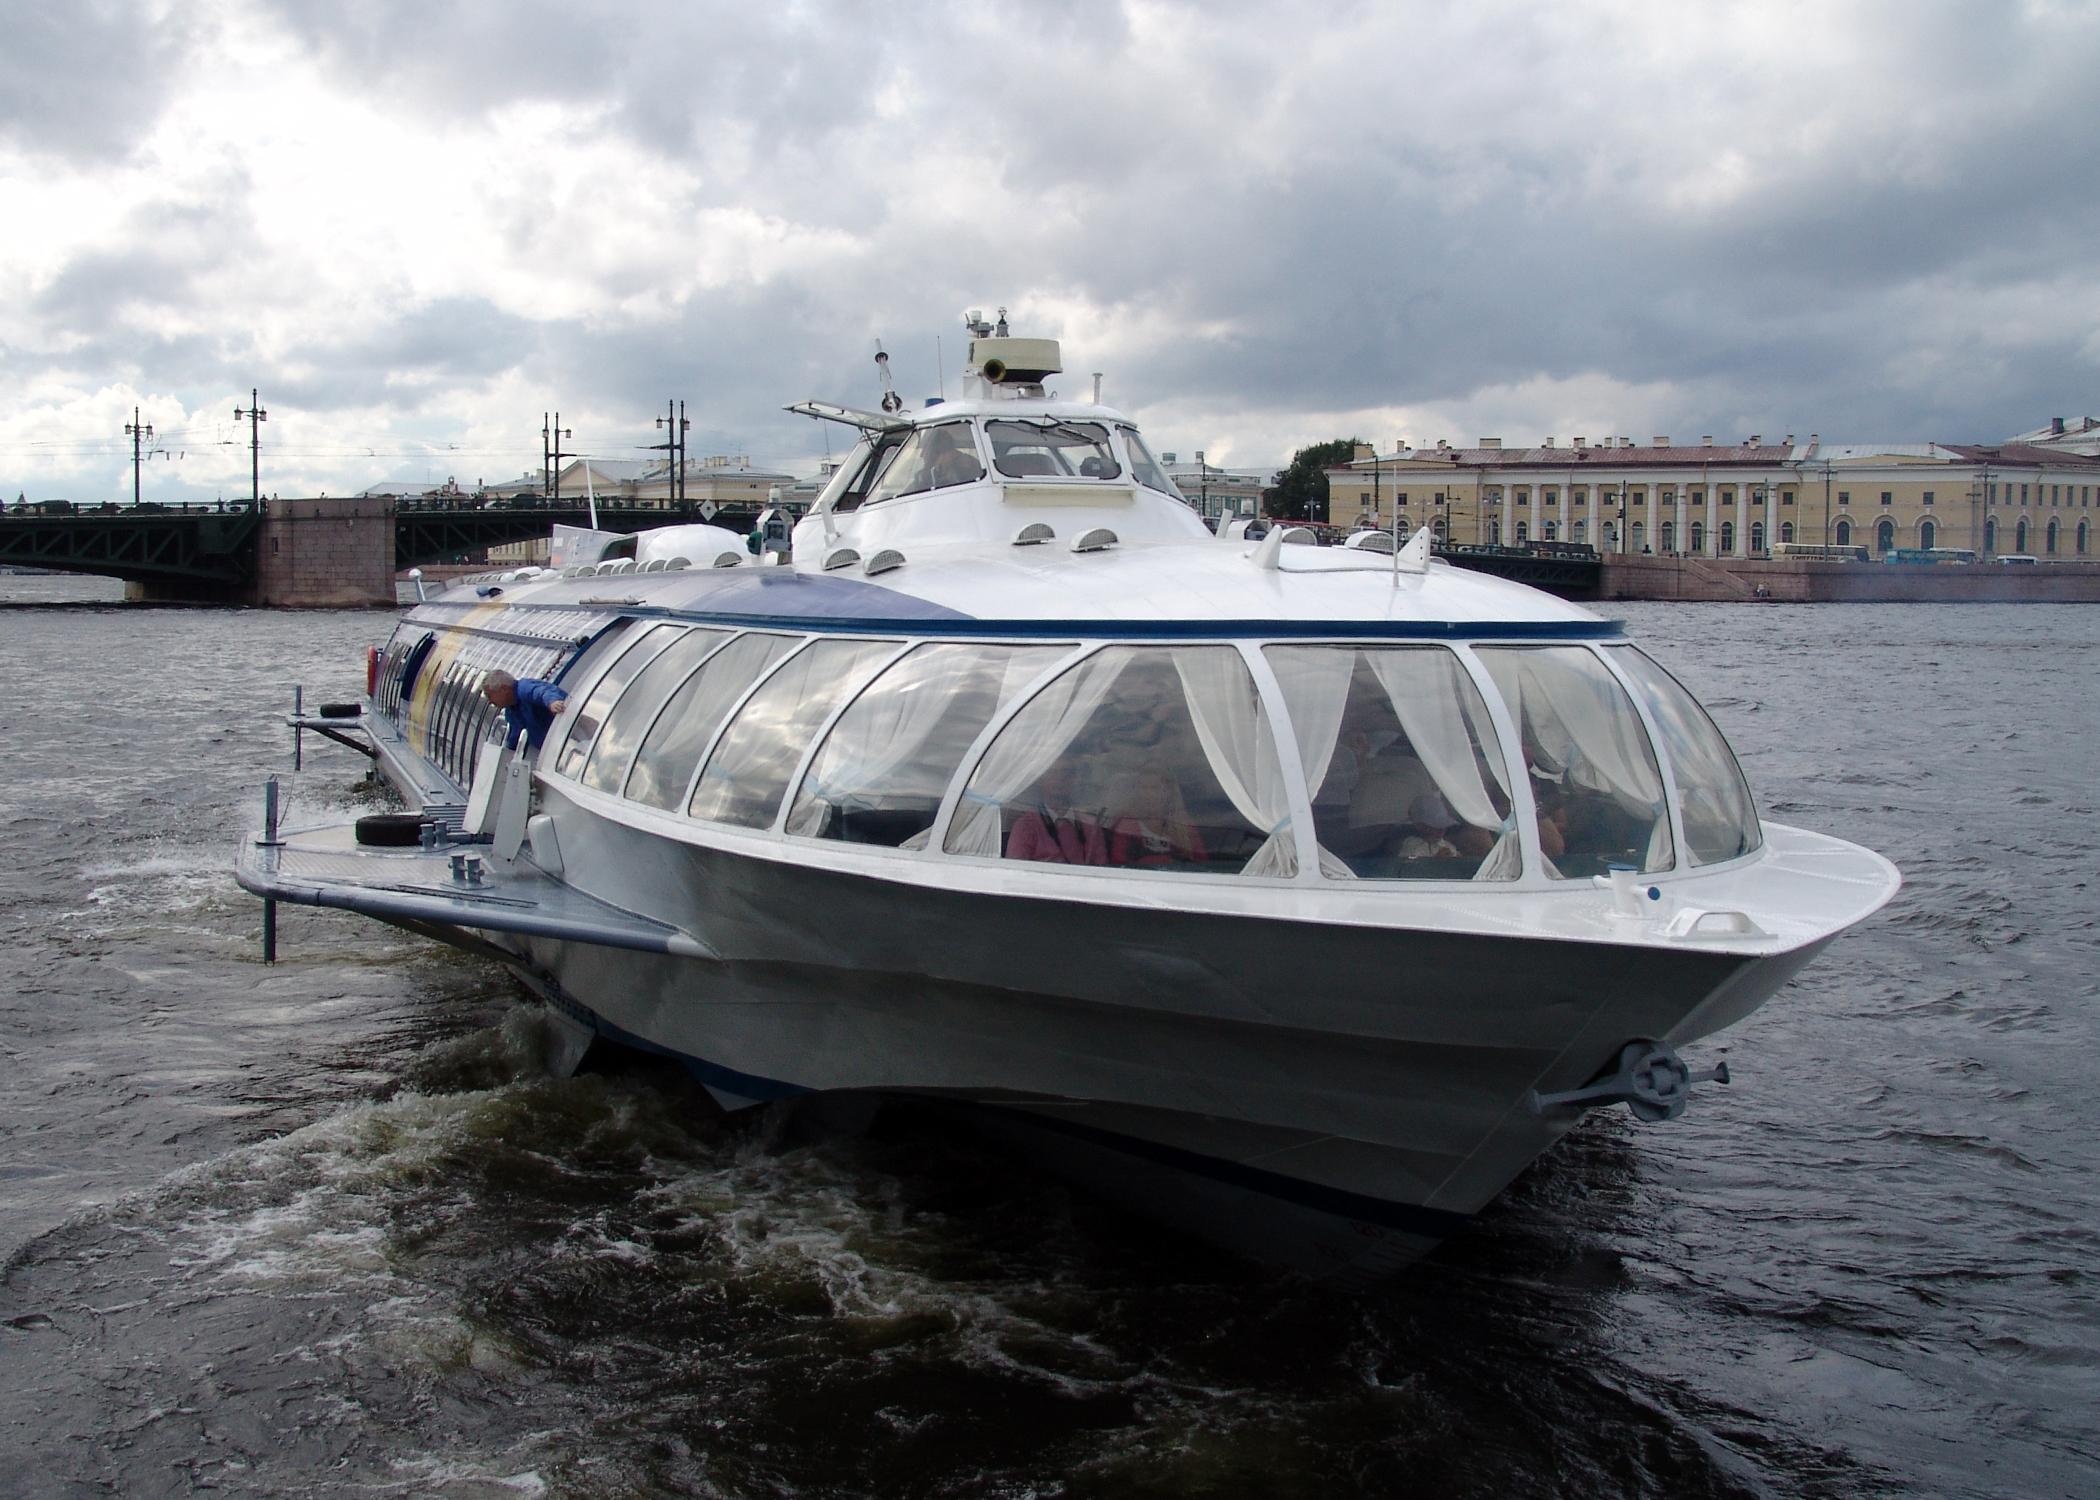 File:St. Petersburg Russia Hydrofoil boat.jpg - Wikipedia